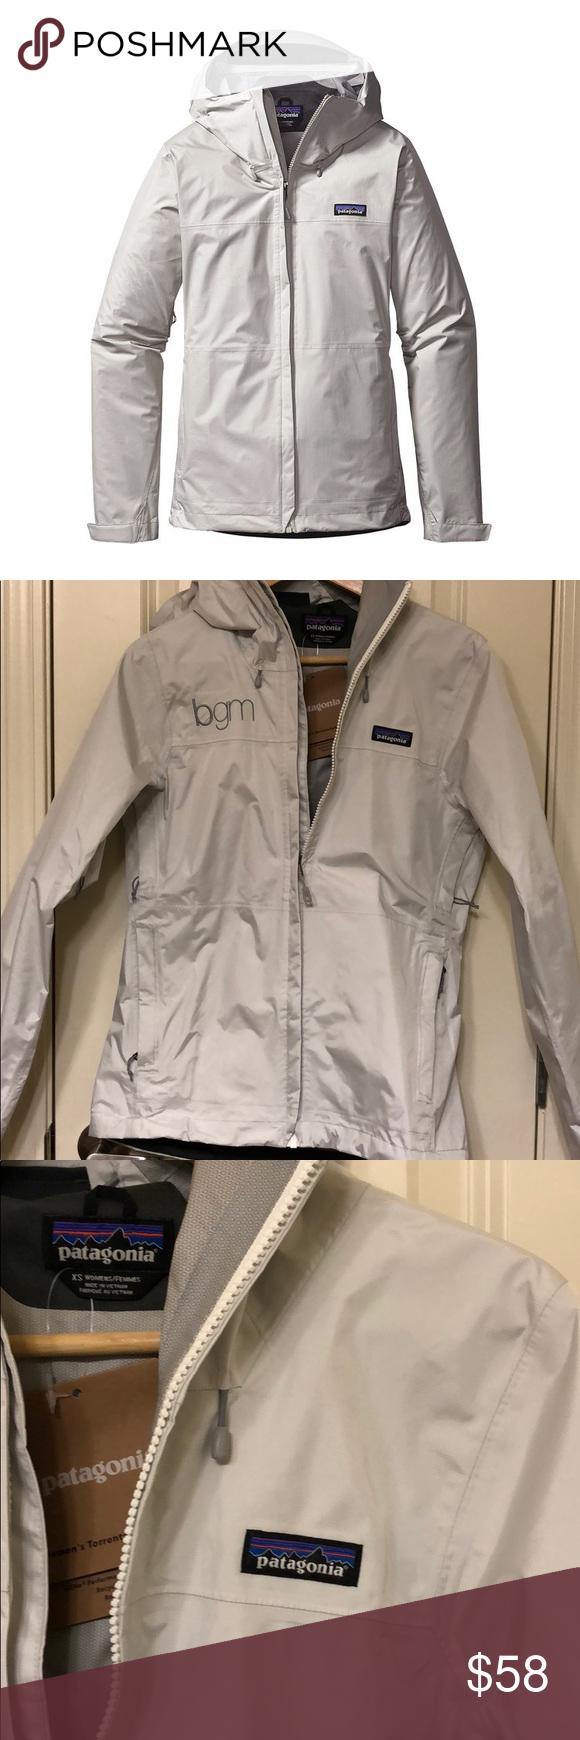 Patagonia jacket Women's Torrentshell Jacket in Birch